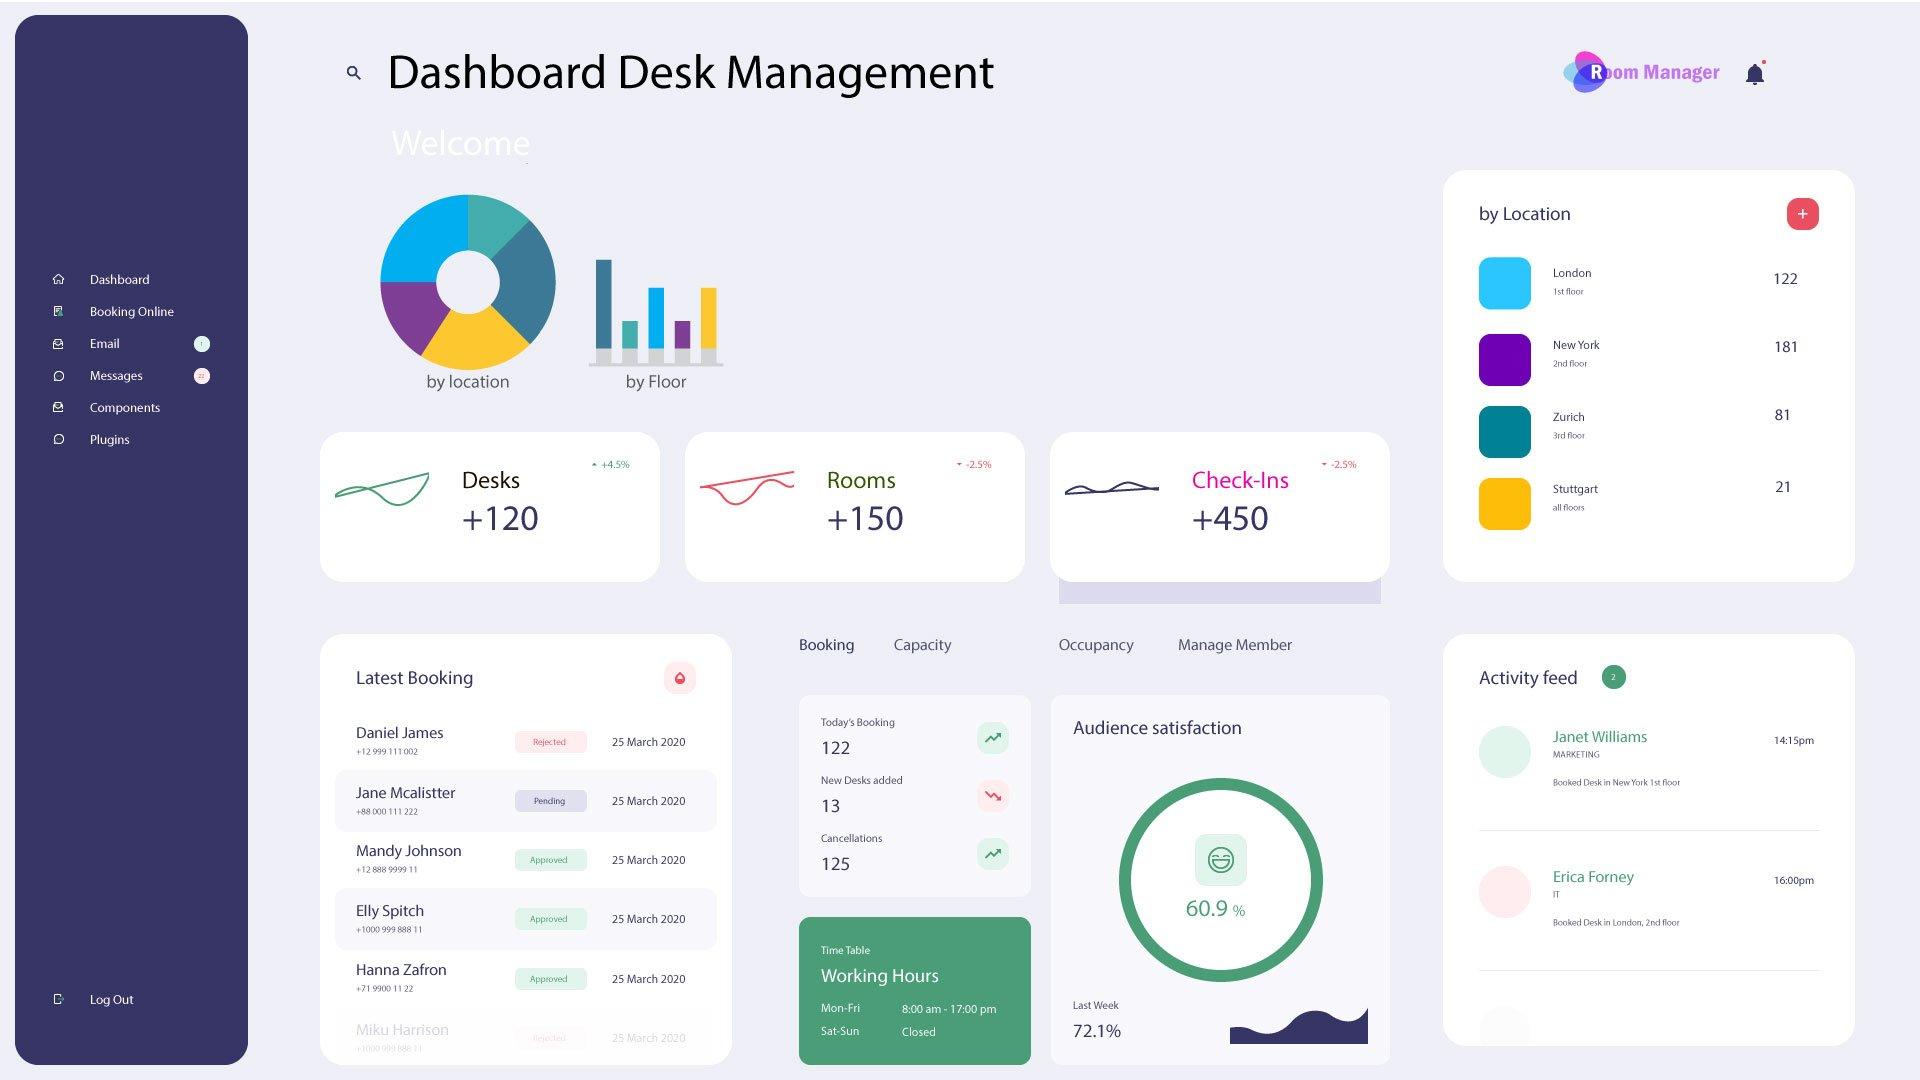 Room Manager 365, Dashboard Desk Management PowerBI